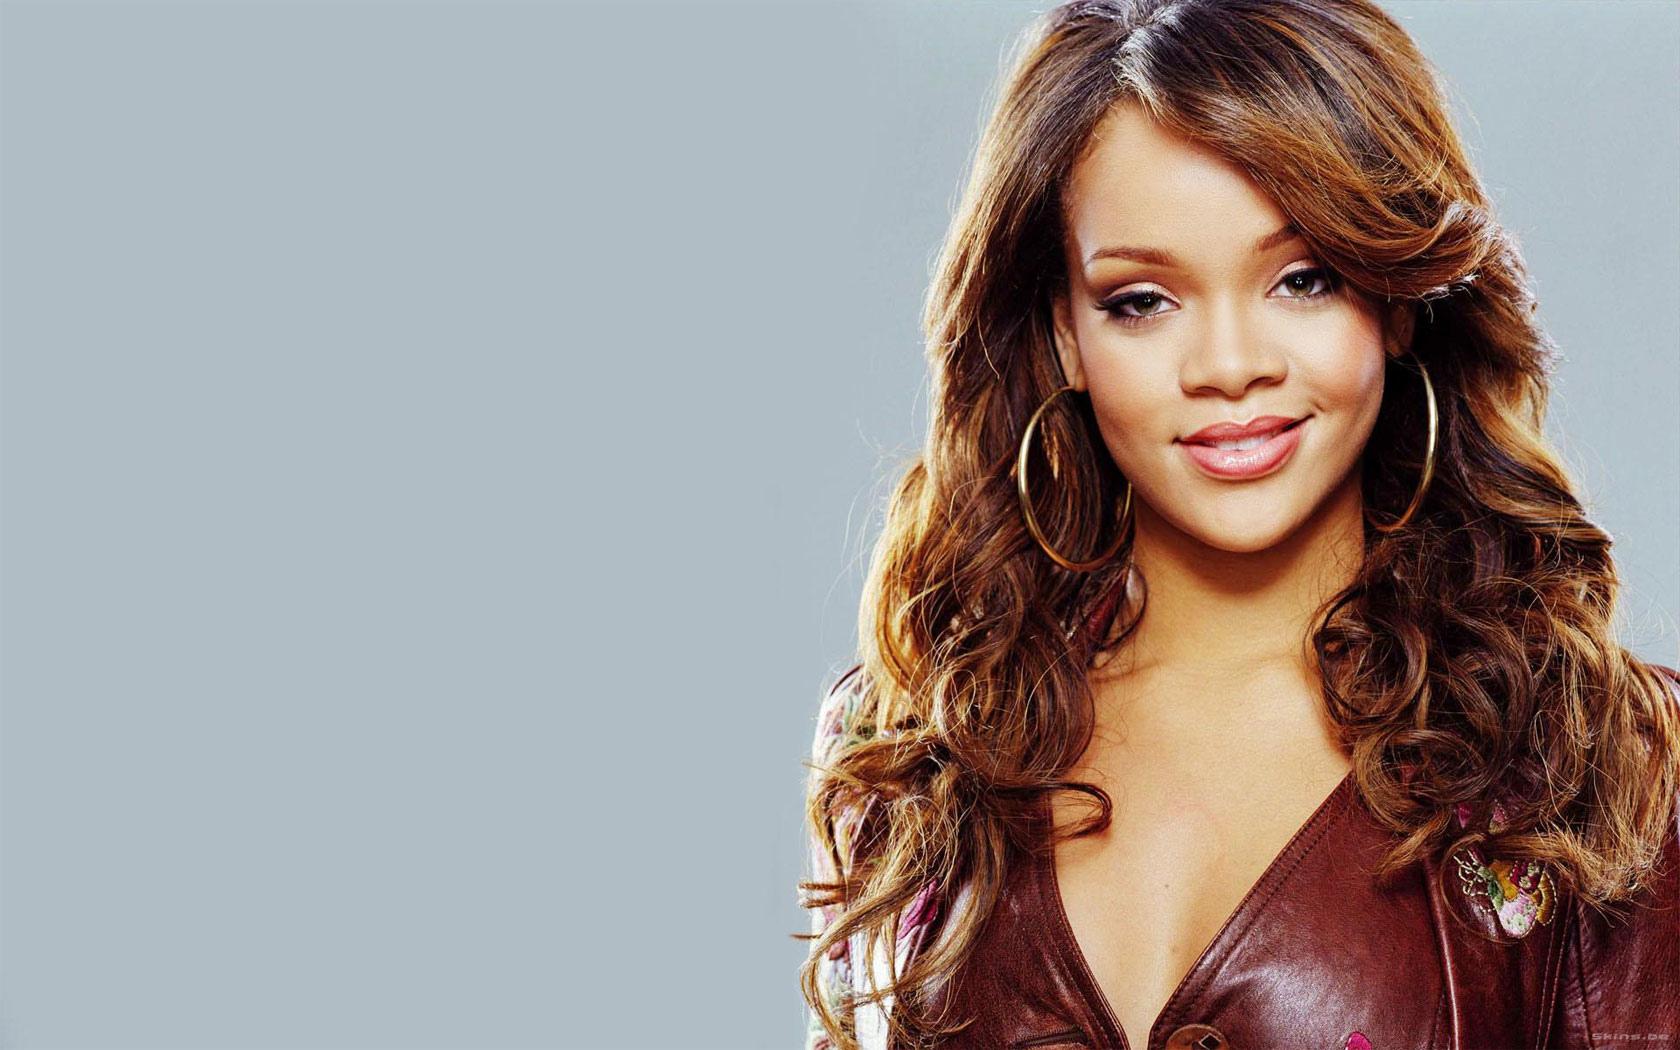 Fondos Wallpapers Hd: Fondos De Pantalla De Rihanna, Wallpapers